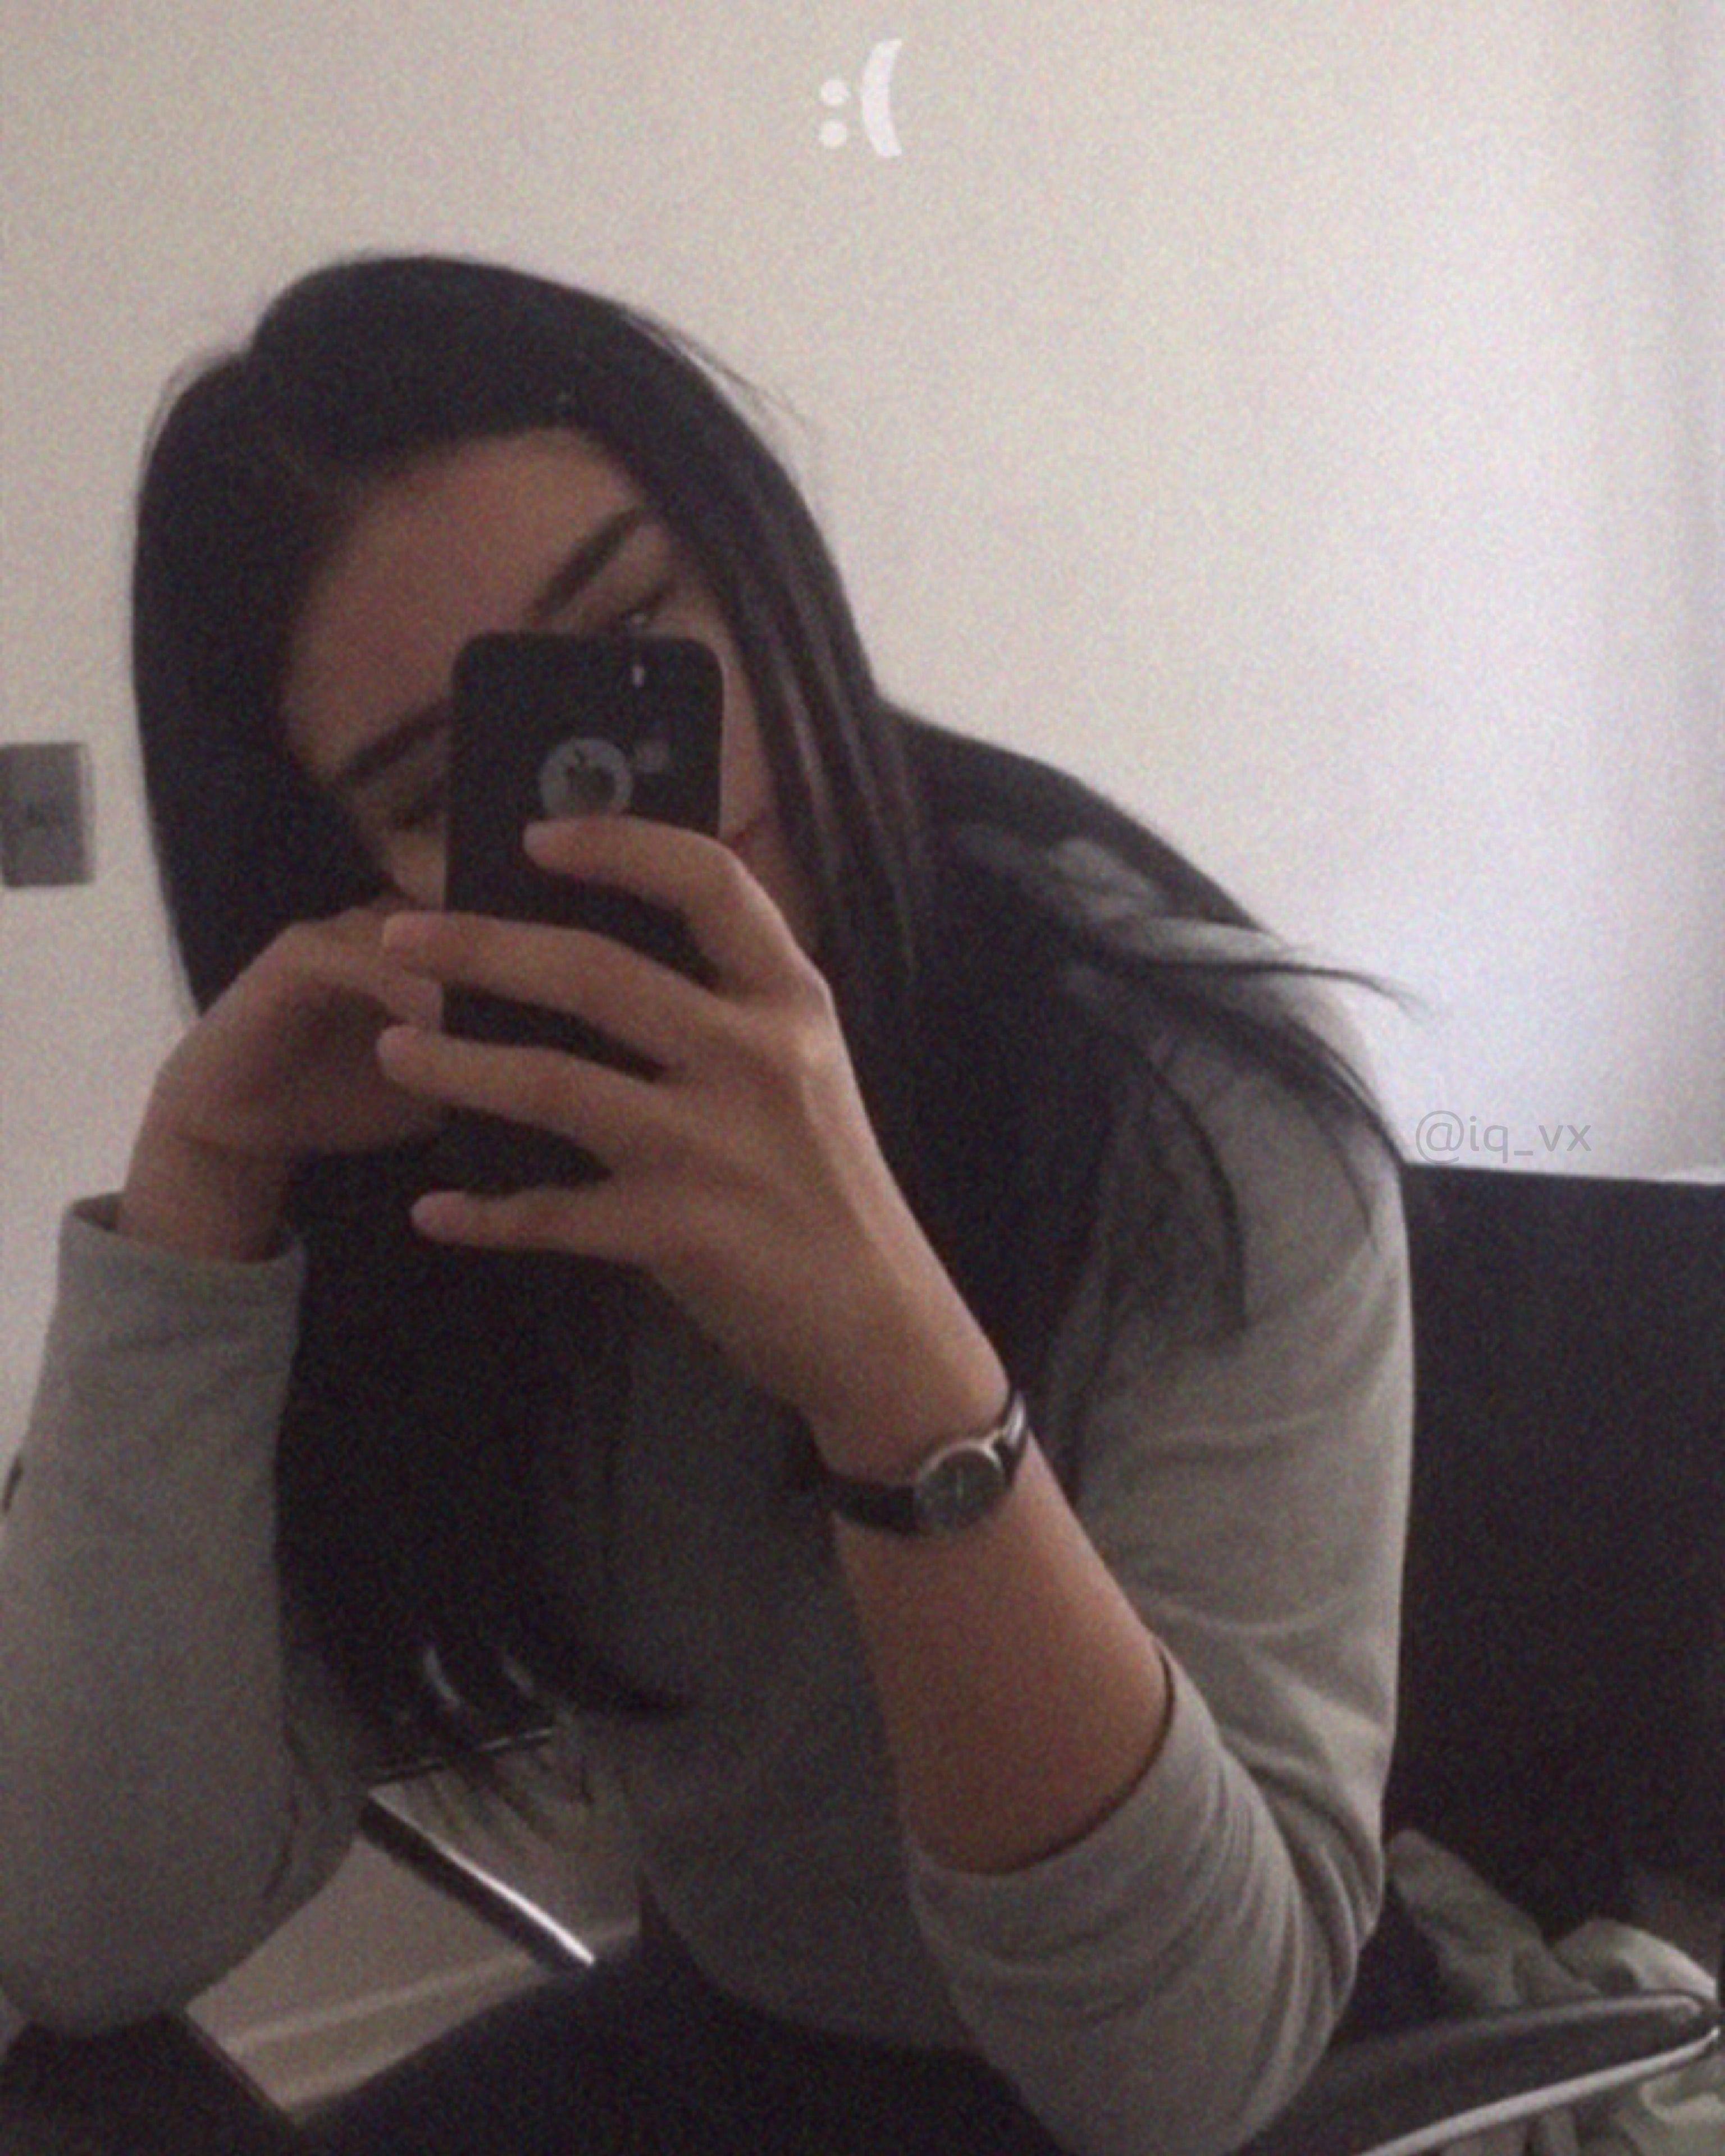 اكسبلور صور افتار افتارات رمزيات رمزيات بنات ستوريات سنابات صور بنات بنات اسئلة ستوري Mirror Selfie Anais Instagram